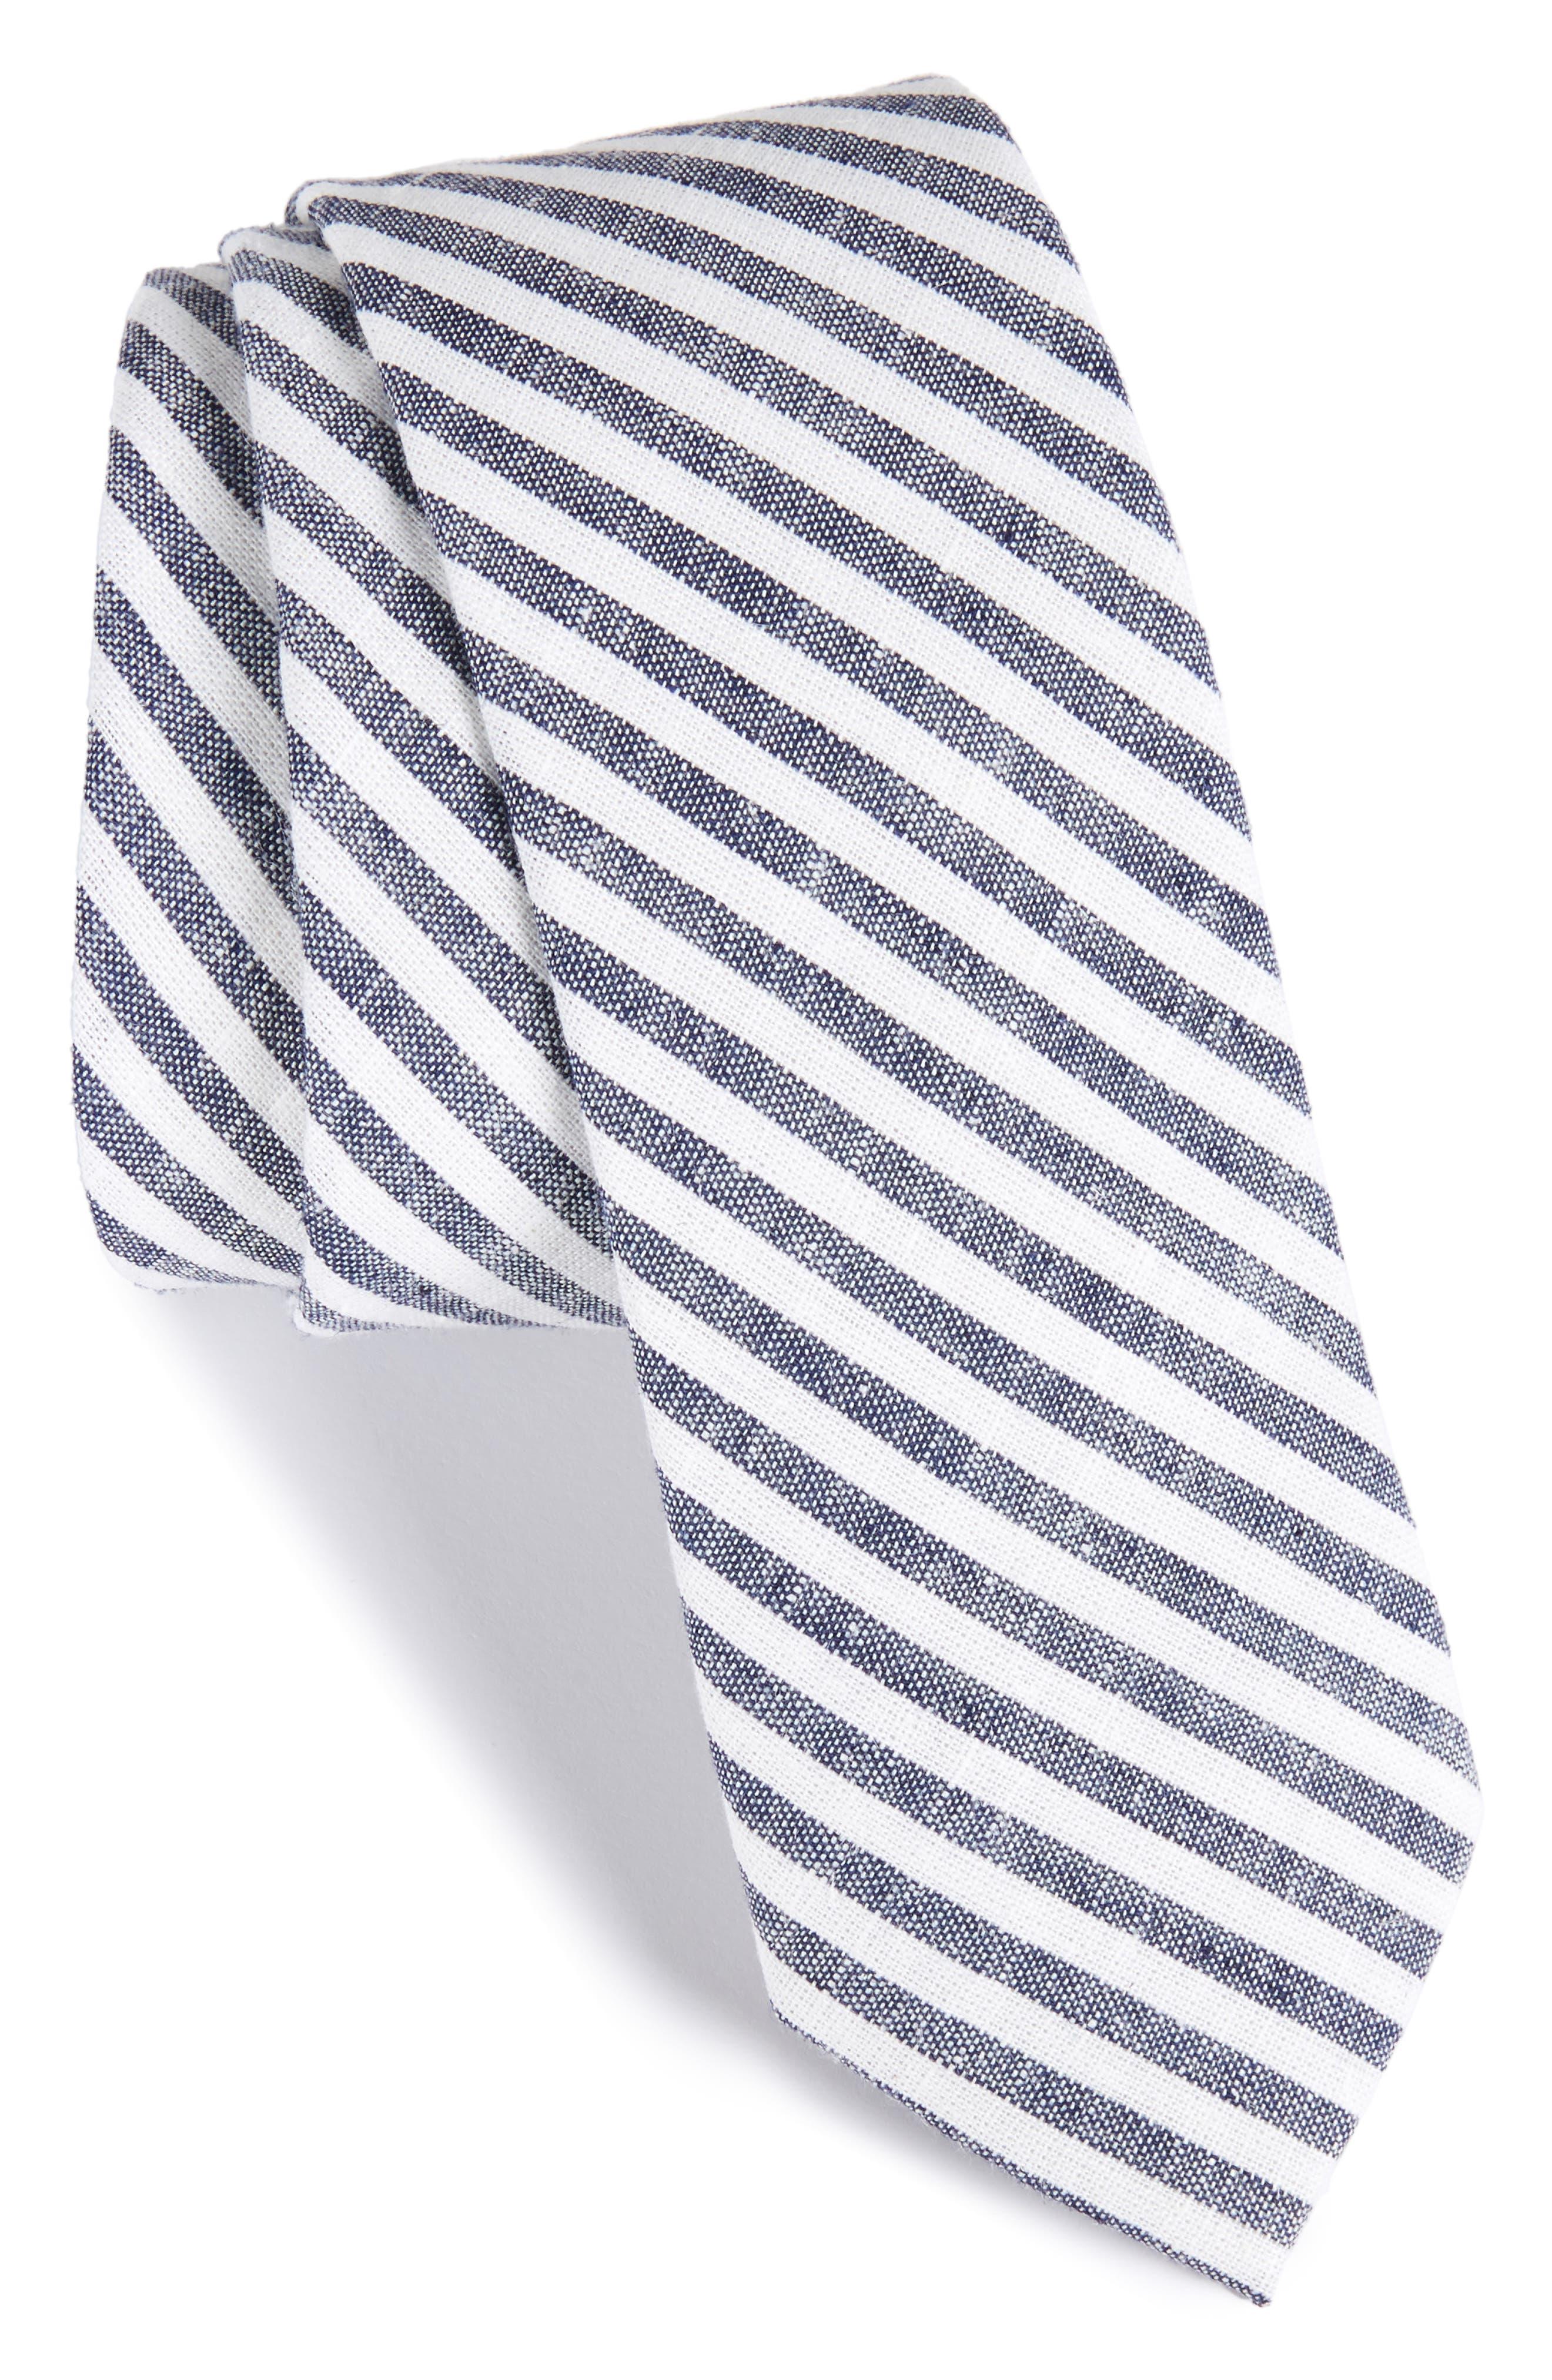 Alternate Image 1 Selected - 1901 Stripe Cotton Tie